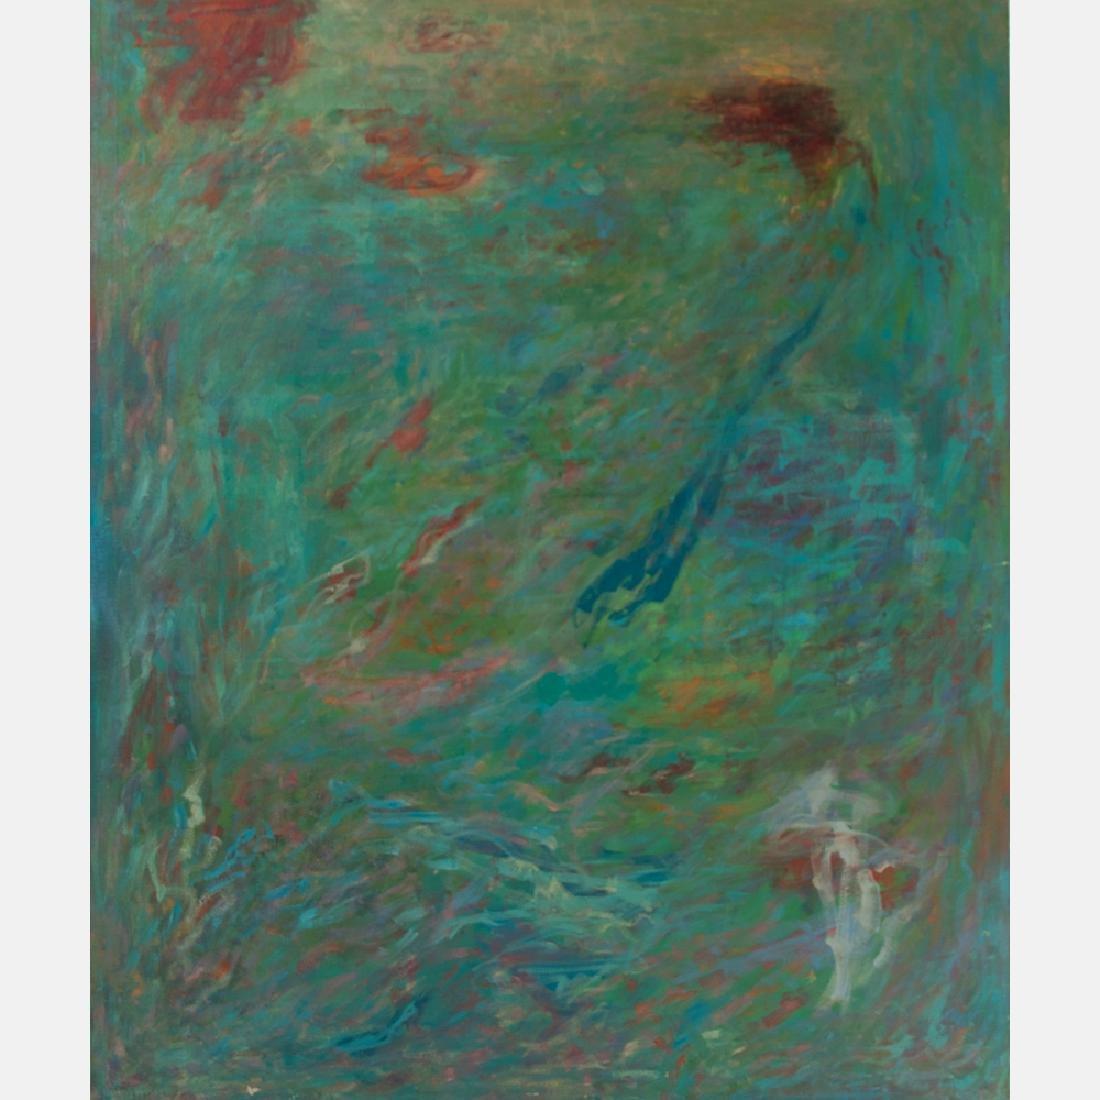 Al Newbill (1921-2012) Untitled, Oil on canvas,